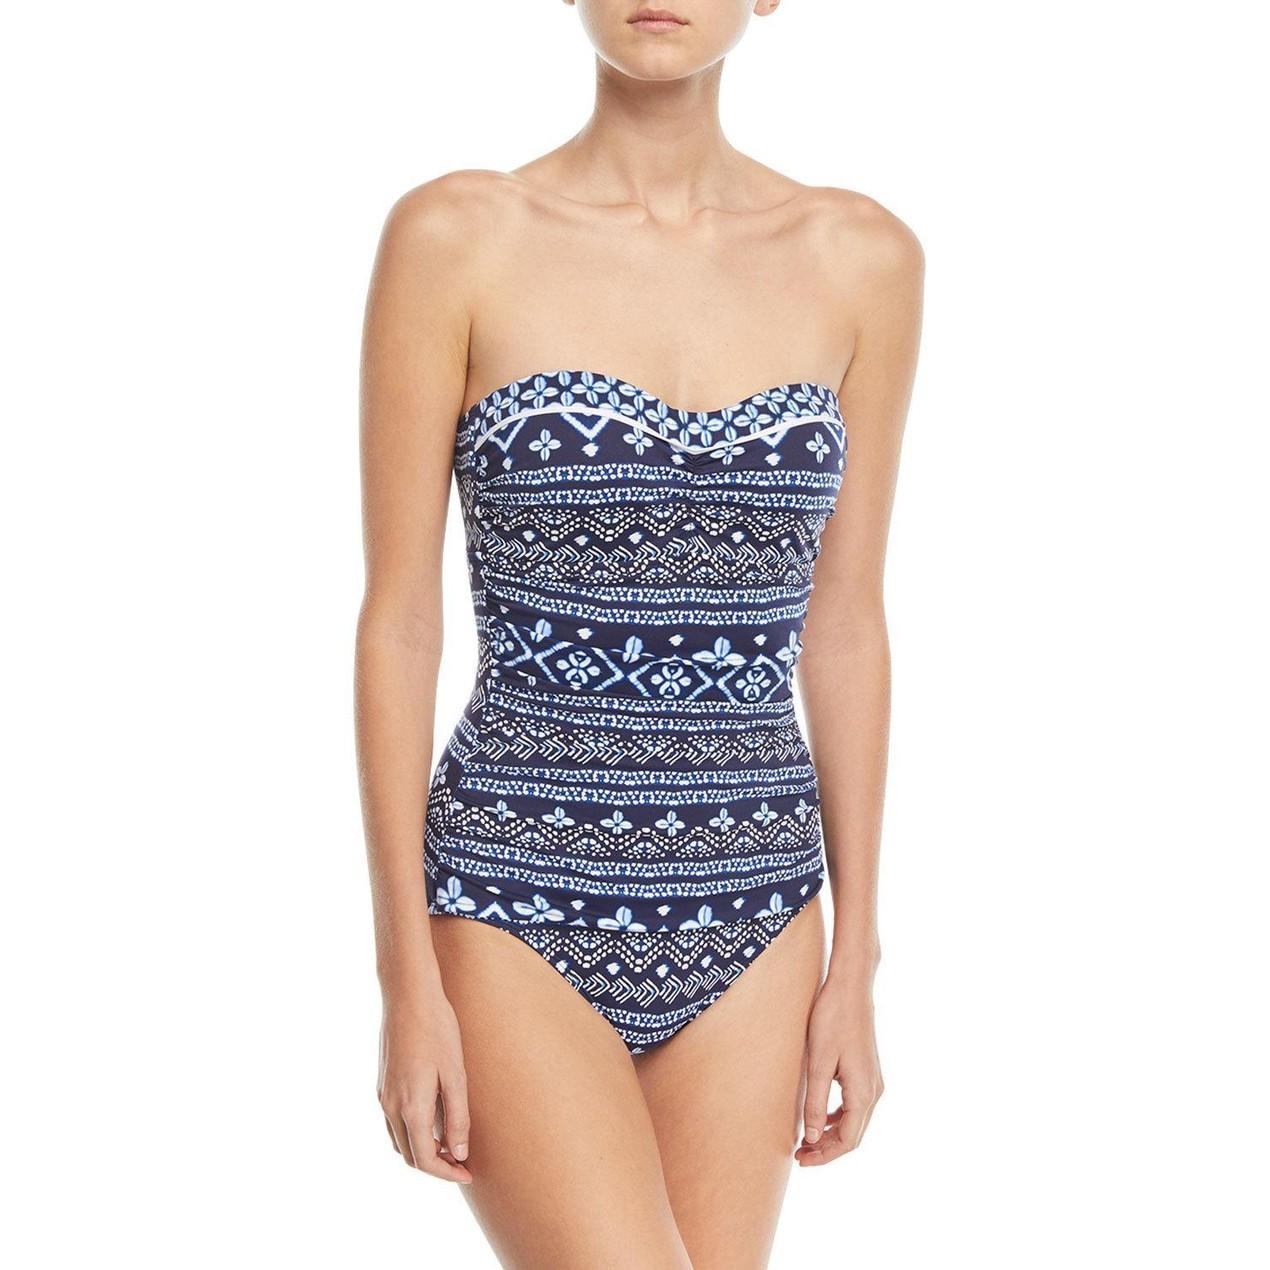 f5dade934f Tommy Bahama Indigo Cowrie Bandeau One-Piece Swimsuit - Tanga